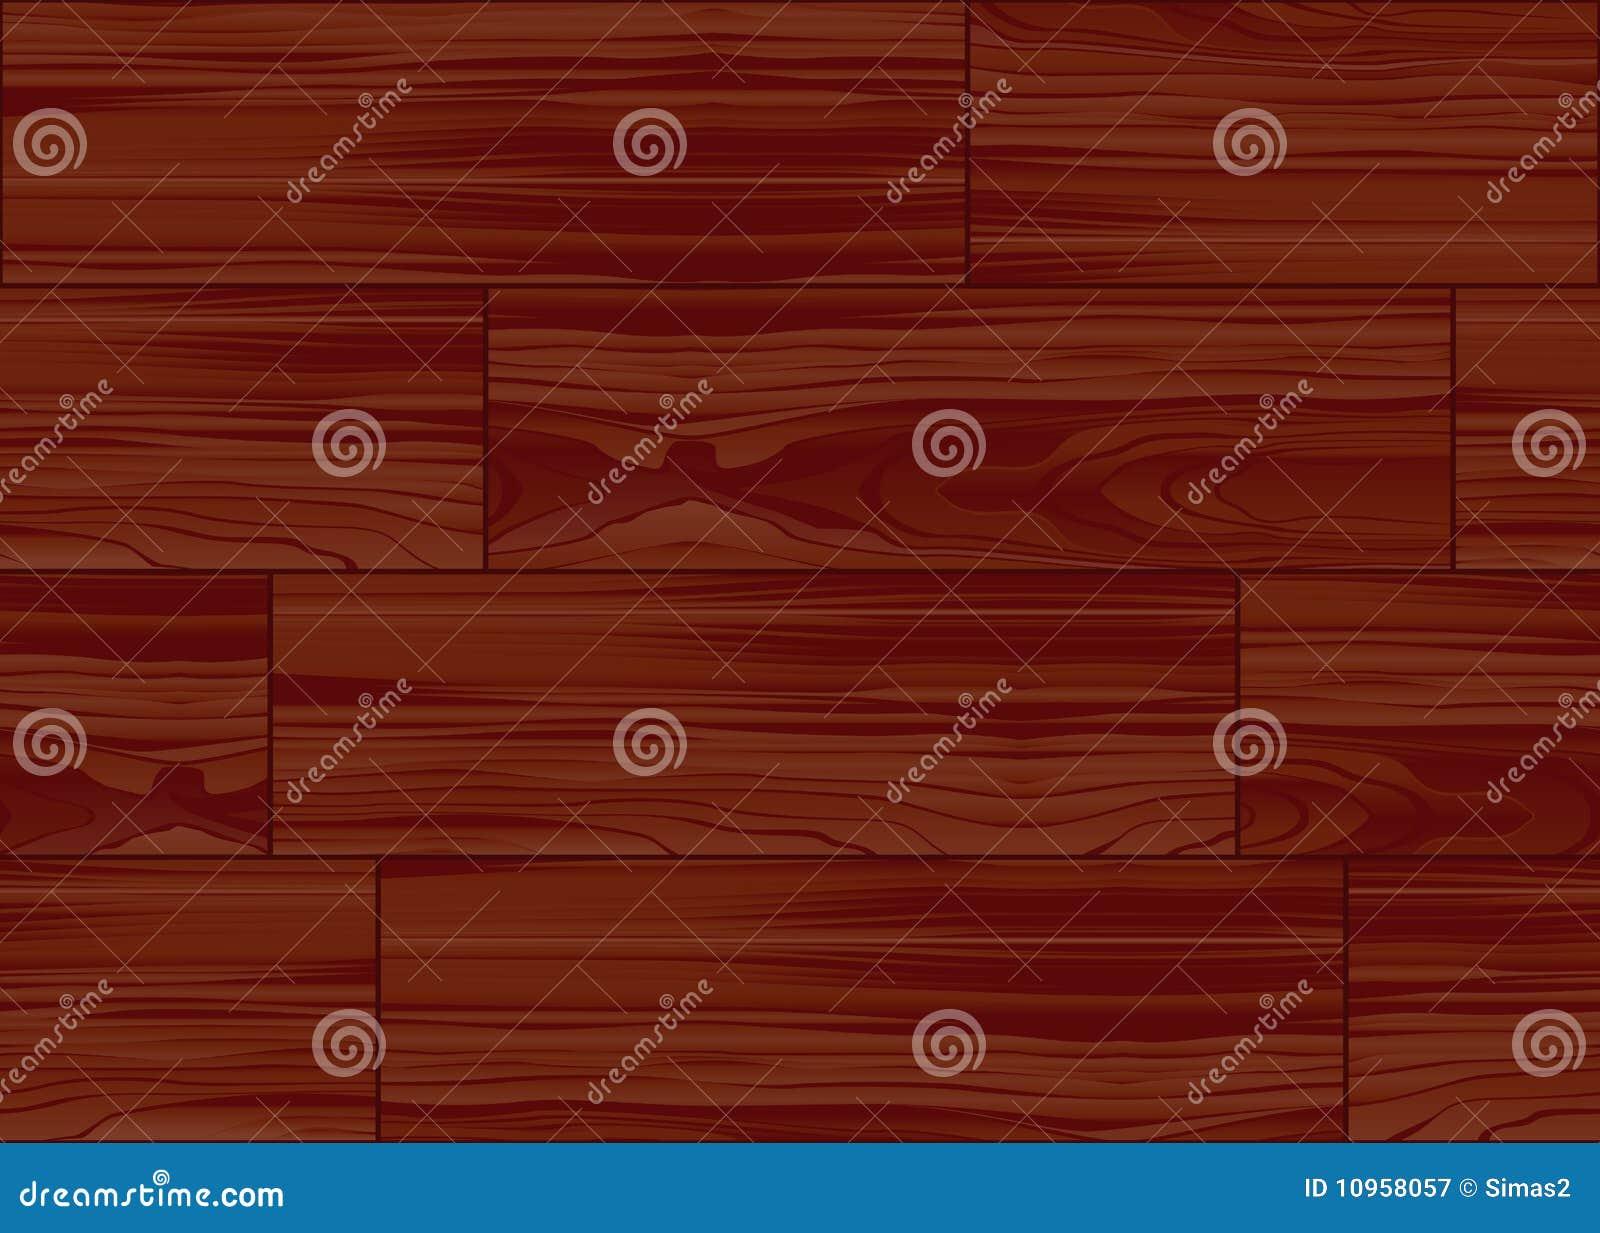 Dark Hardwood Floor Pattern With Wood Parquet Floor Pattern Tile Parquet Floor Pattern Tile Stock Vector Illustration Of